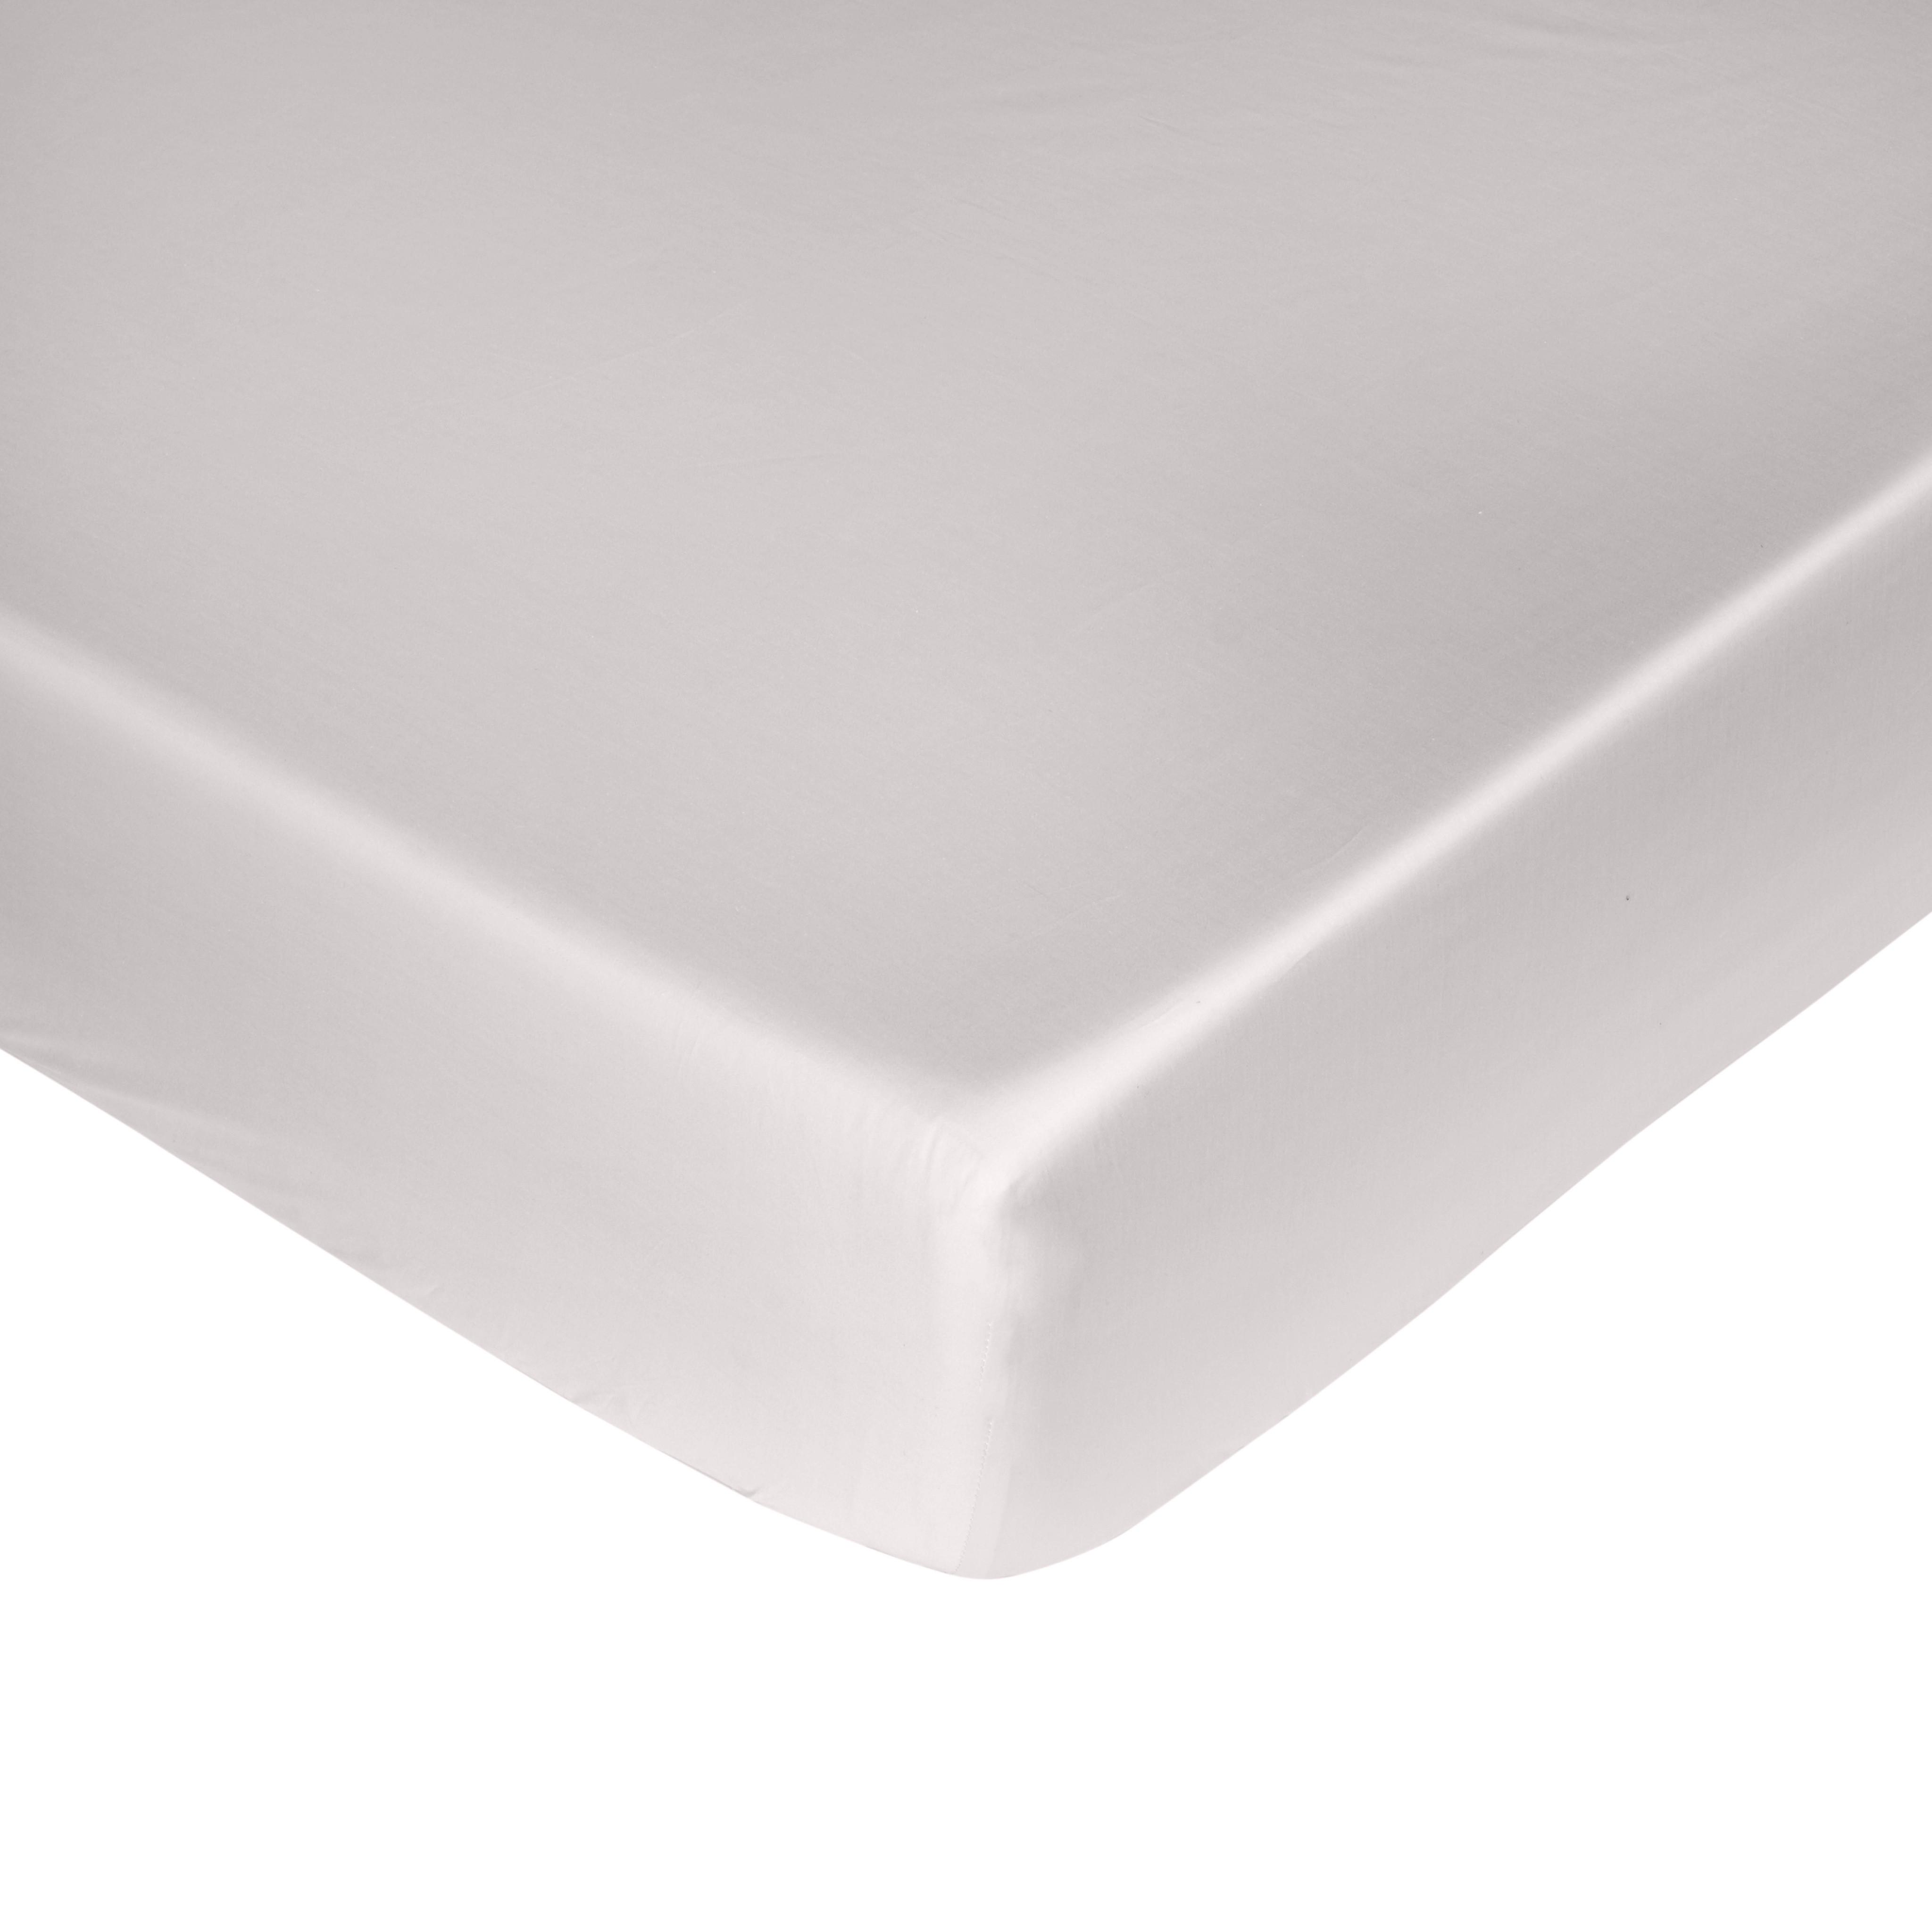 Lenzuolo angoli raso alta qualità Interno 11, Grigio perla, large image number 0